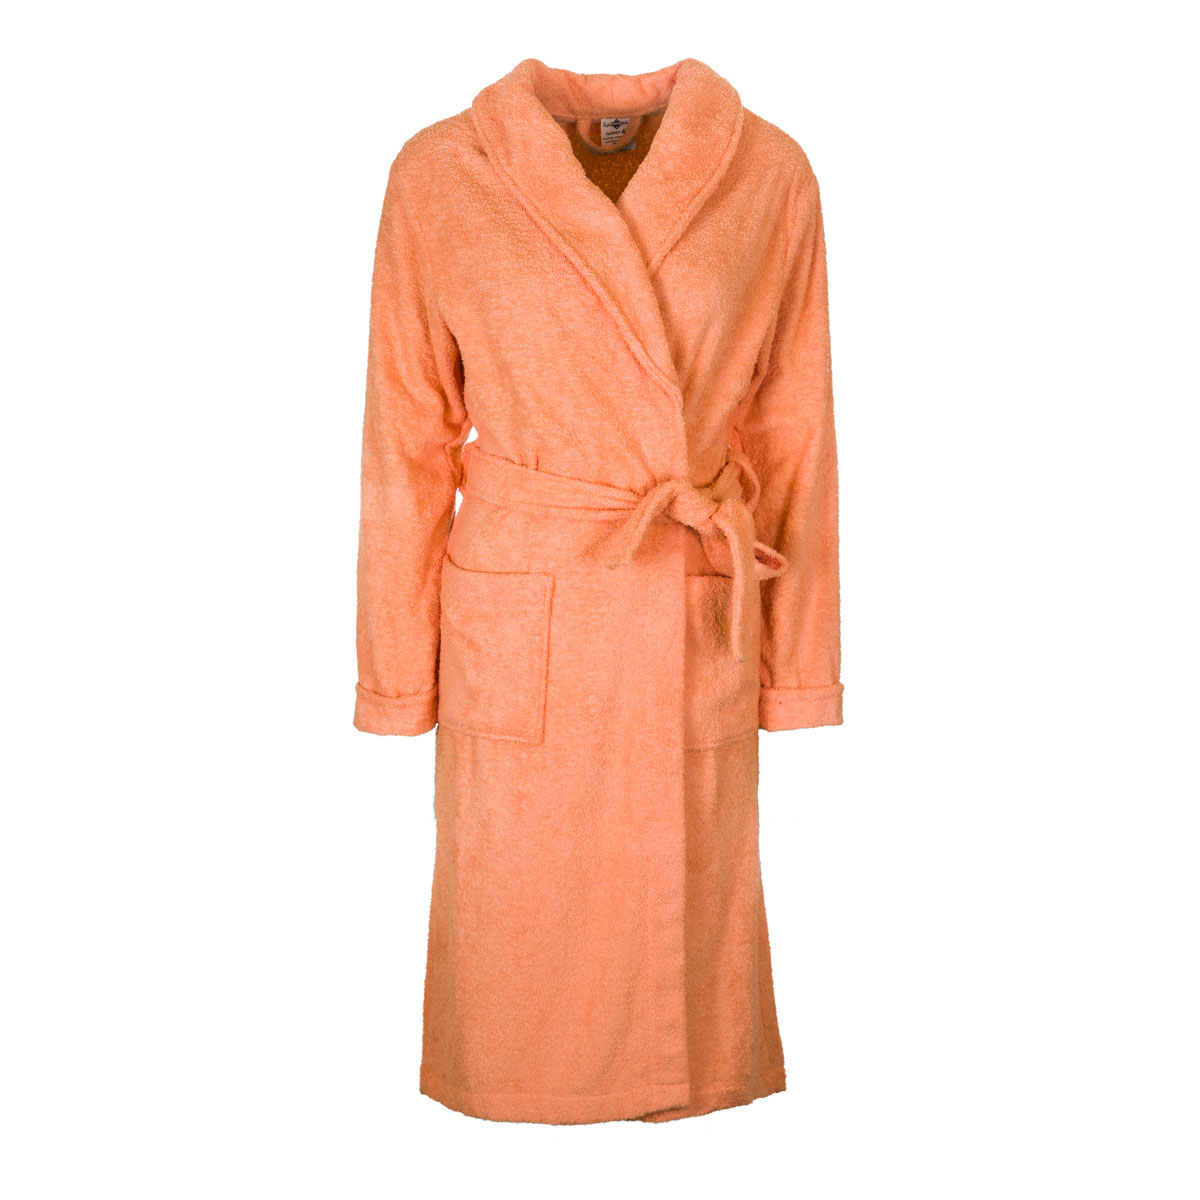 Жен. халат арт. 04-0090 Персиковый р. 48 жен платье арт 16 0255 василек р 48